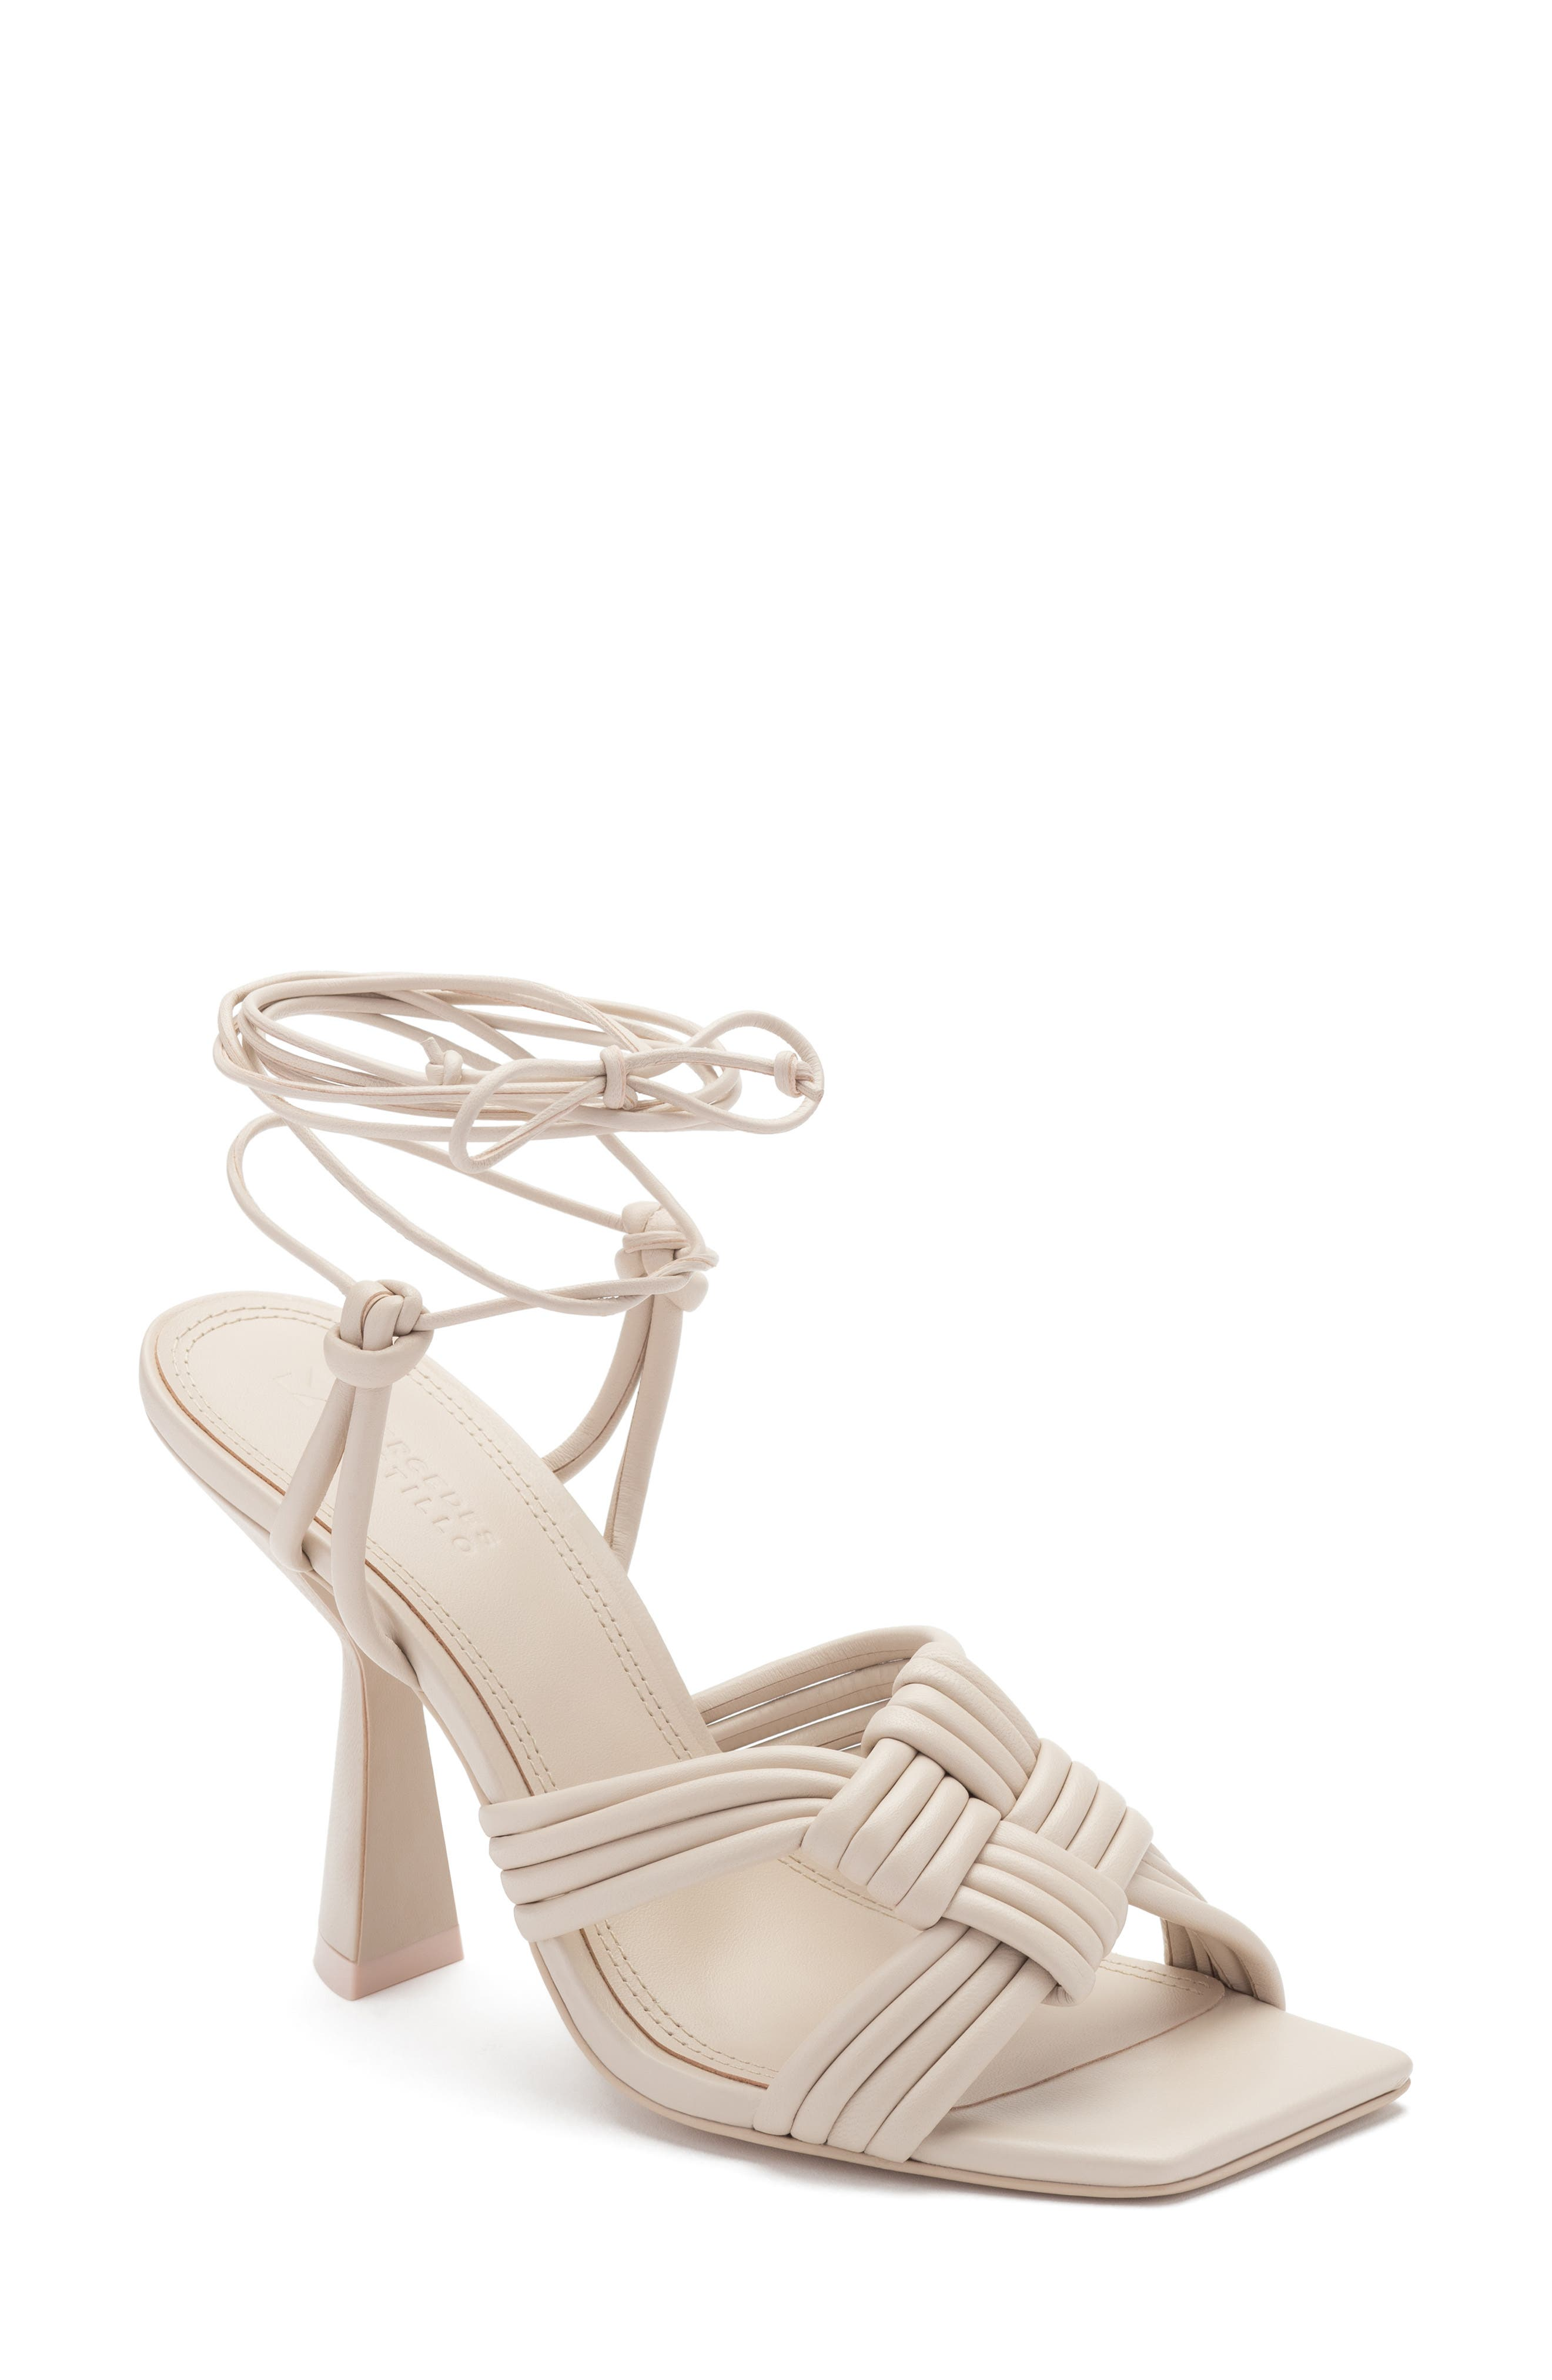 Tamara Strappy Sandal